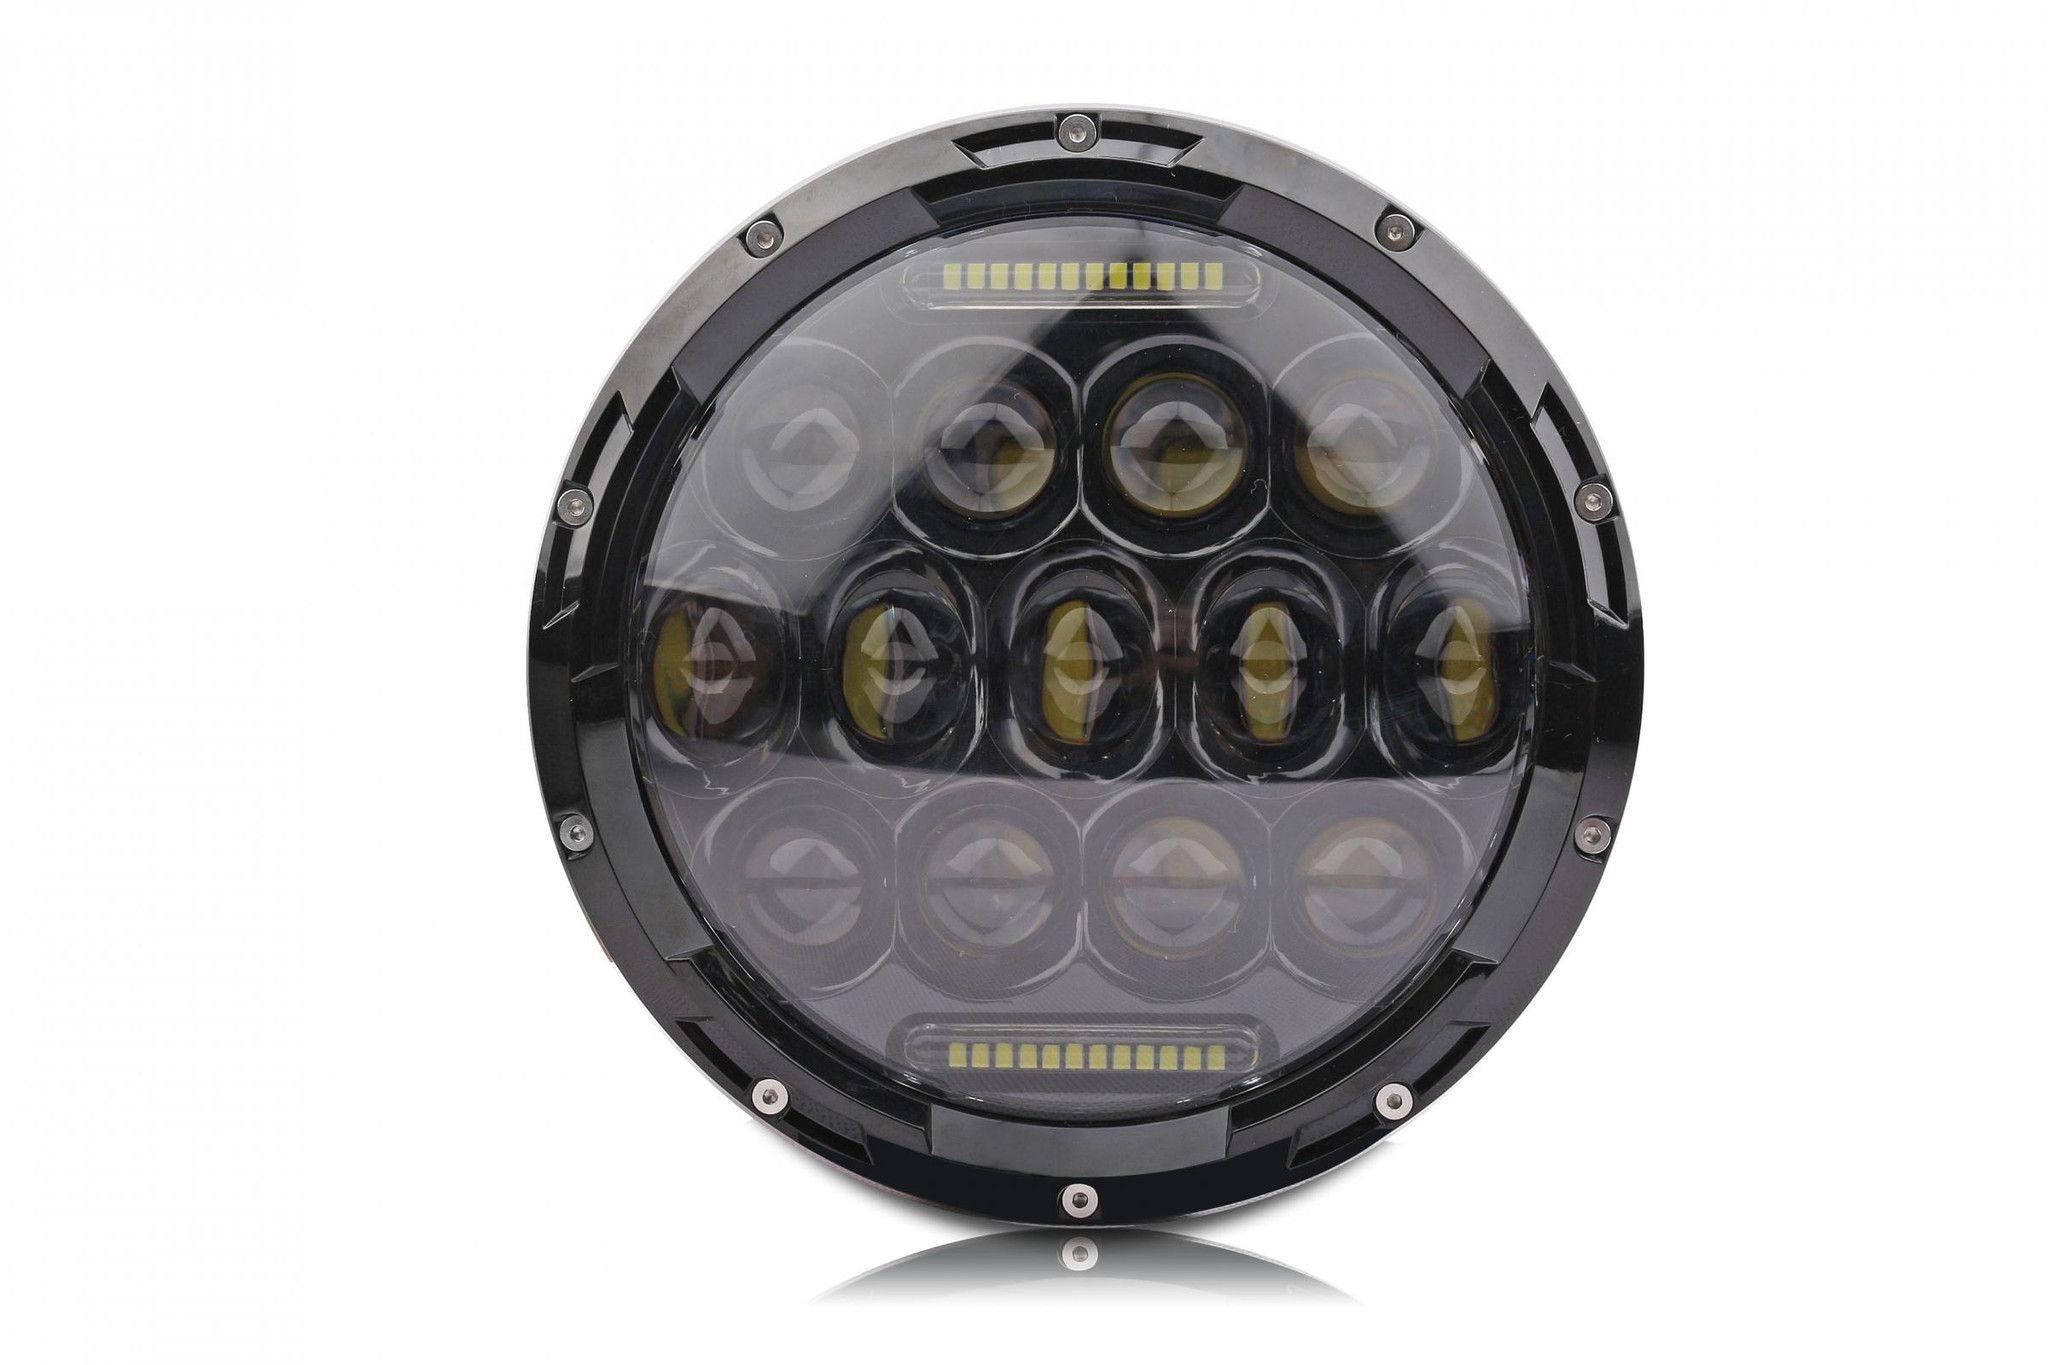 7 round led headlight 75 watt jeep led light bar headlights 7 round led headlight 75 watt aloadofball Images